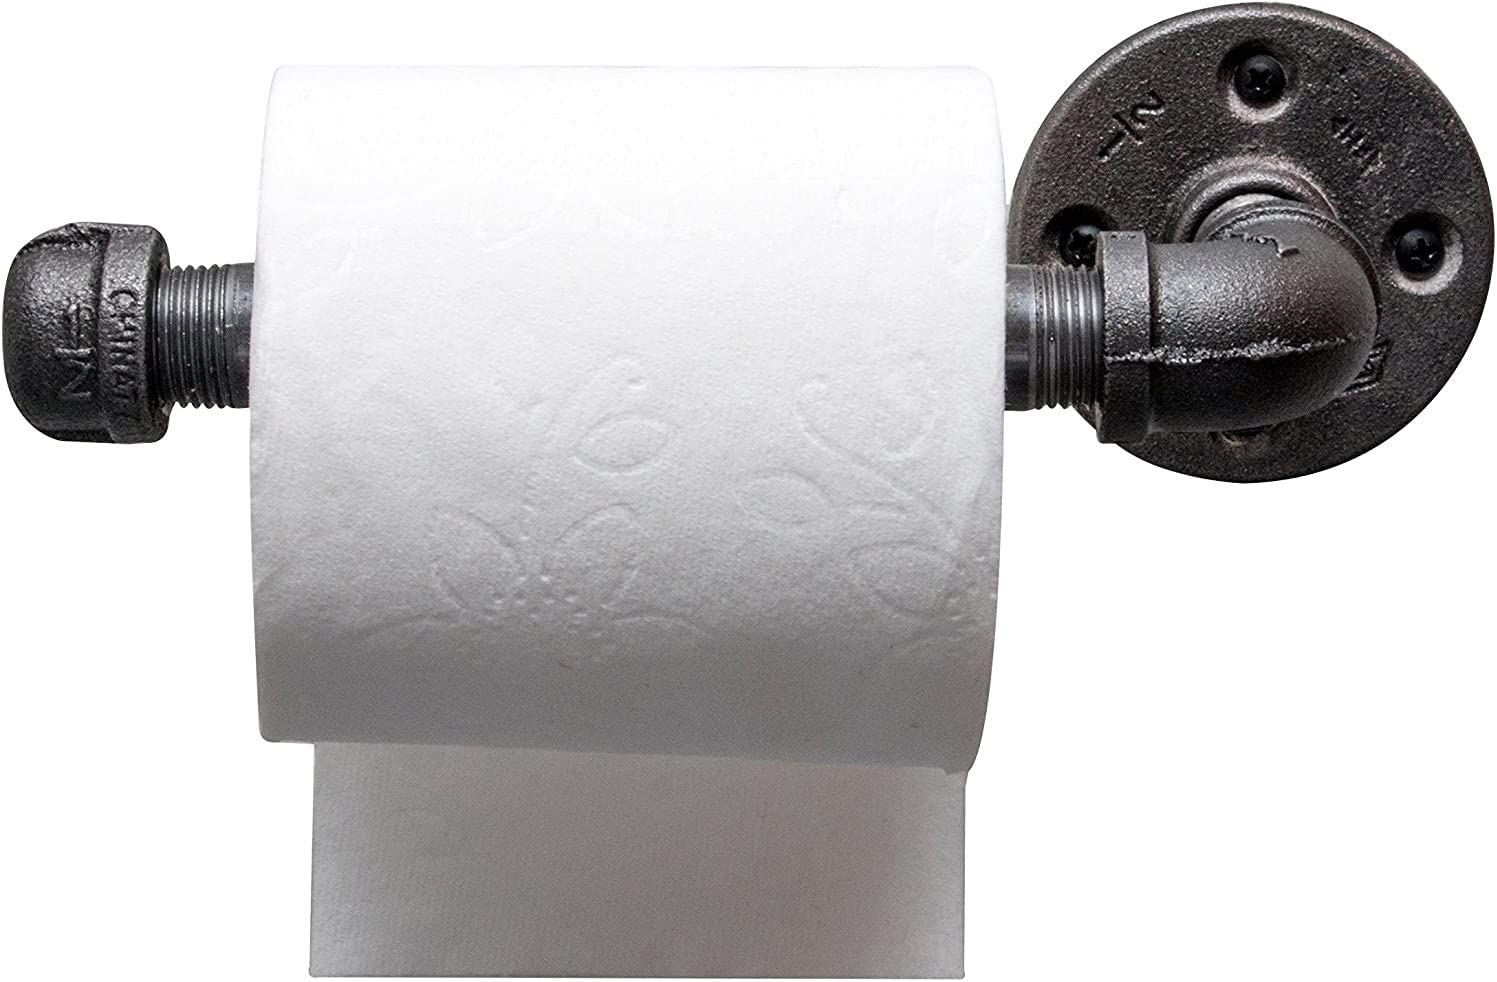 Ironwerks Industrial Toilet Paper Holder - Rustic Bathroom Décor, Matte Black Iron Towel Holders for Bathrooms   Real Matte Black Iron Material